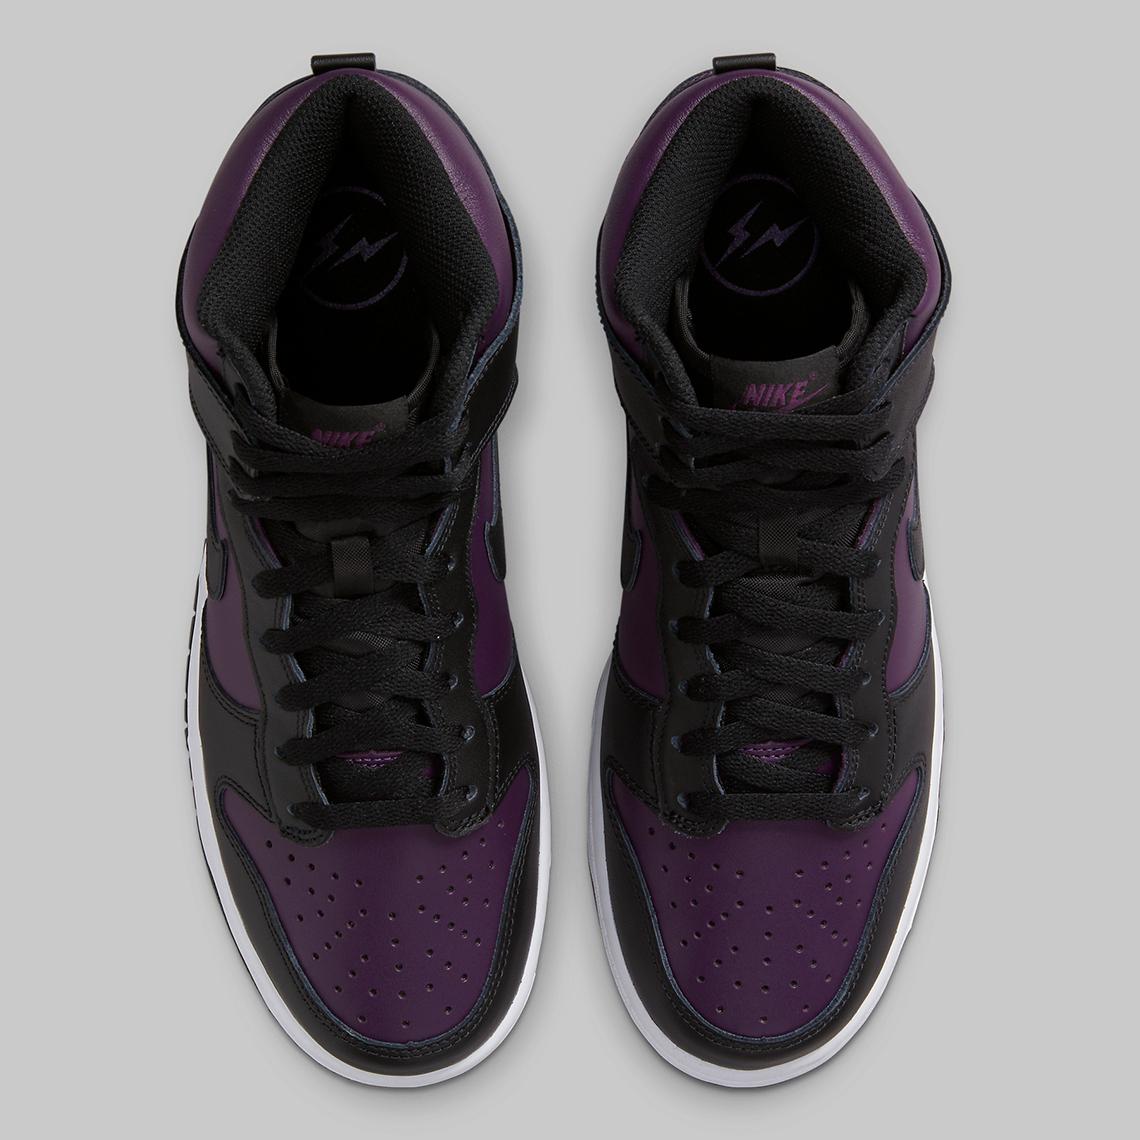 Fragment Design x Nike Dunk High ''Beijing'' - DJ0382-600